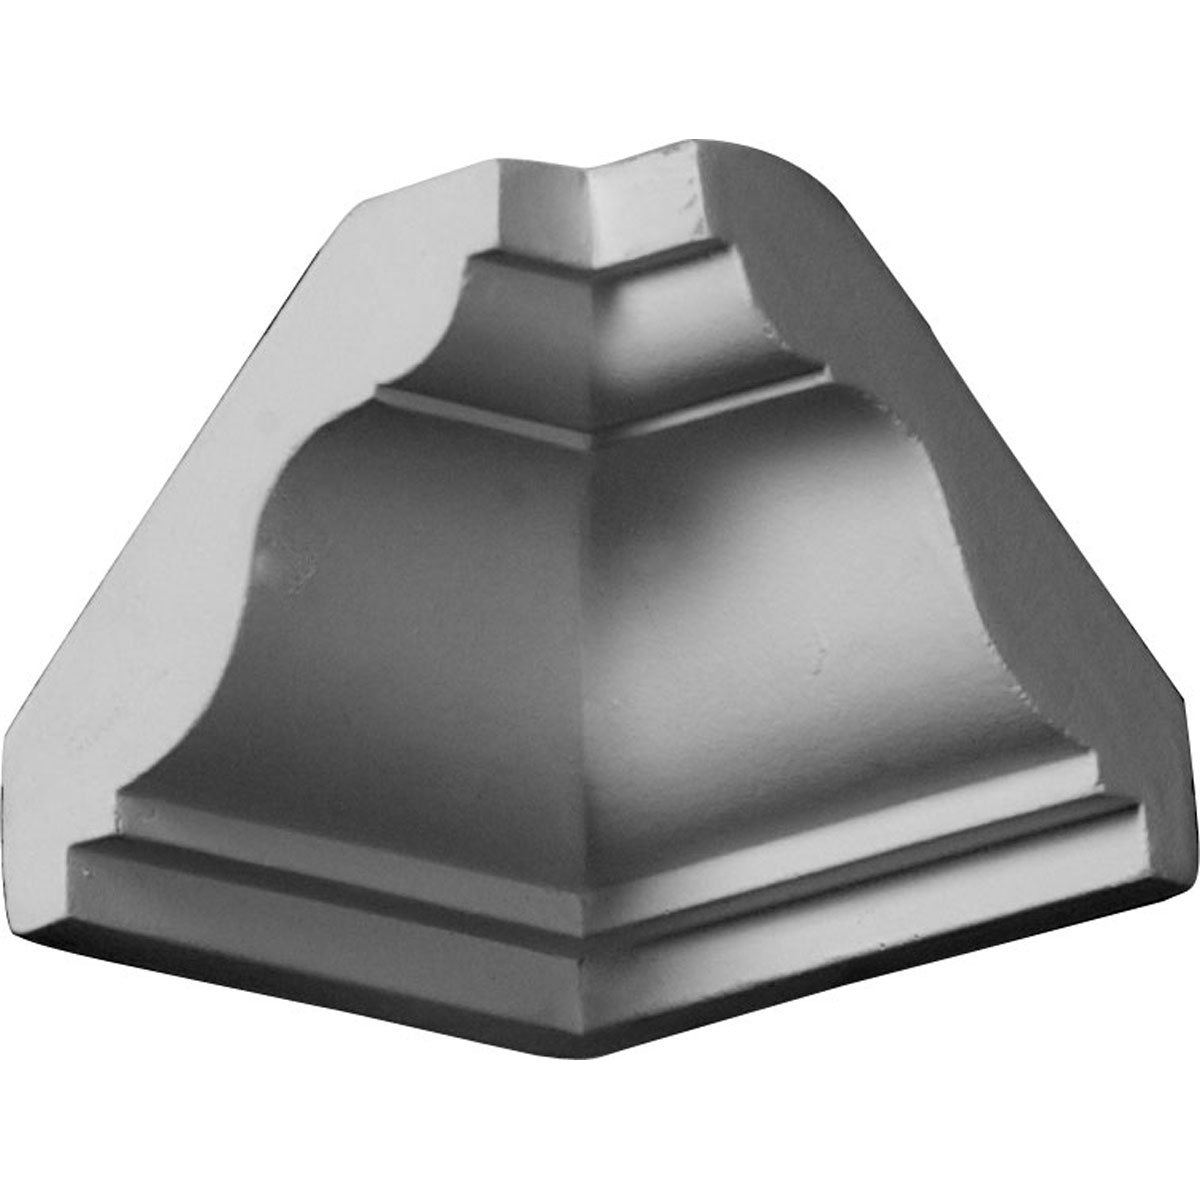 Ekena Millwork MIC02X02LY-CASE-4 2'' P x 2'' H Inside Corner for Molding MLD02X02X03LY (4-Pack)